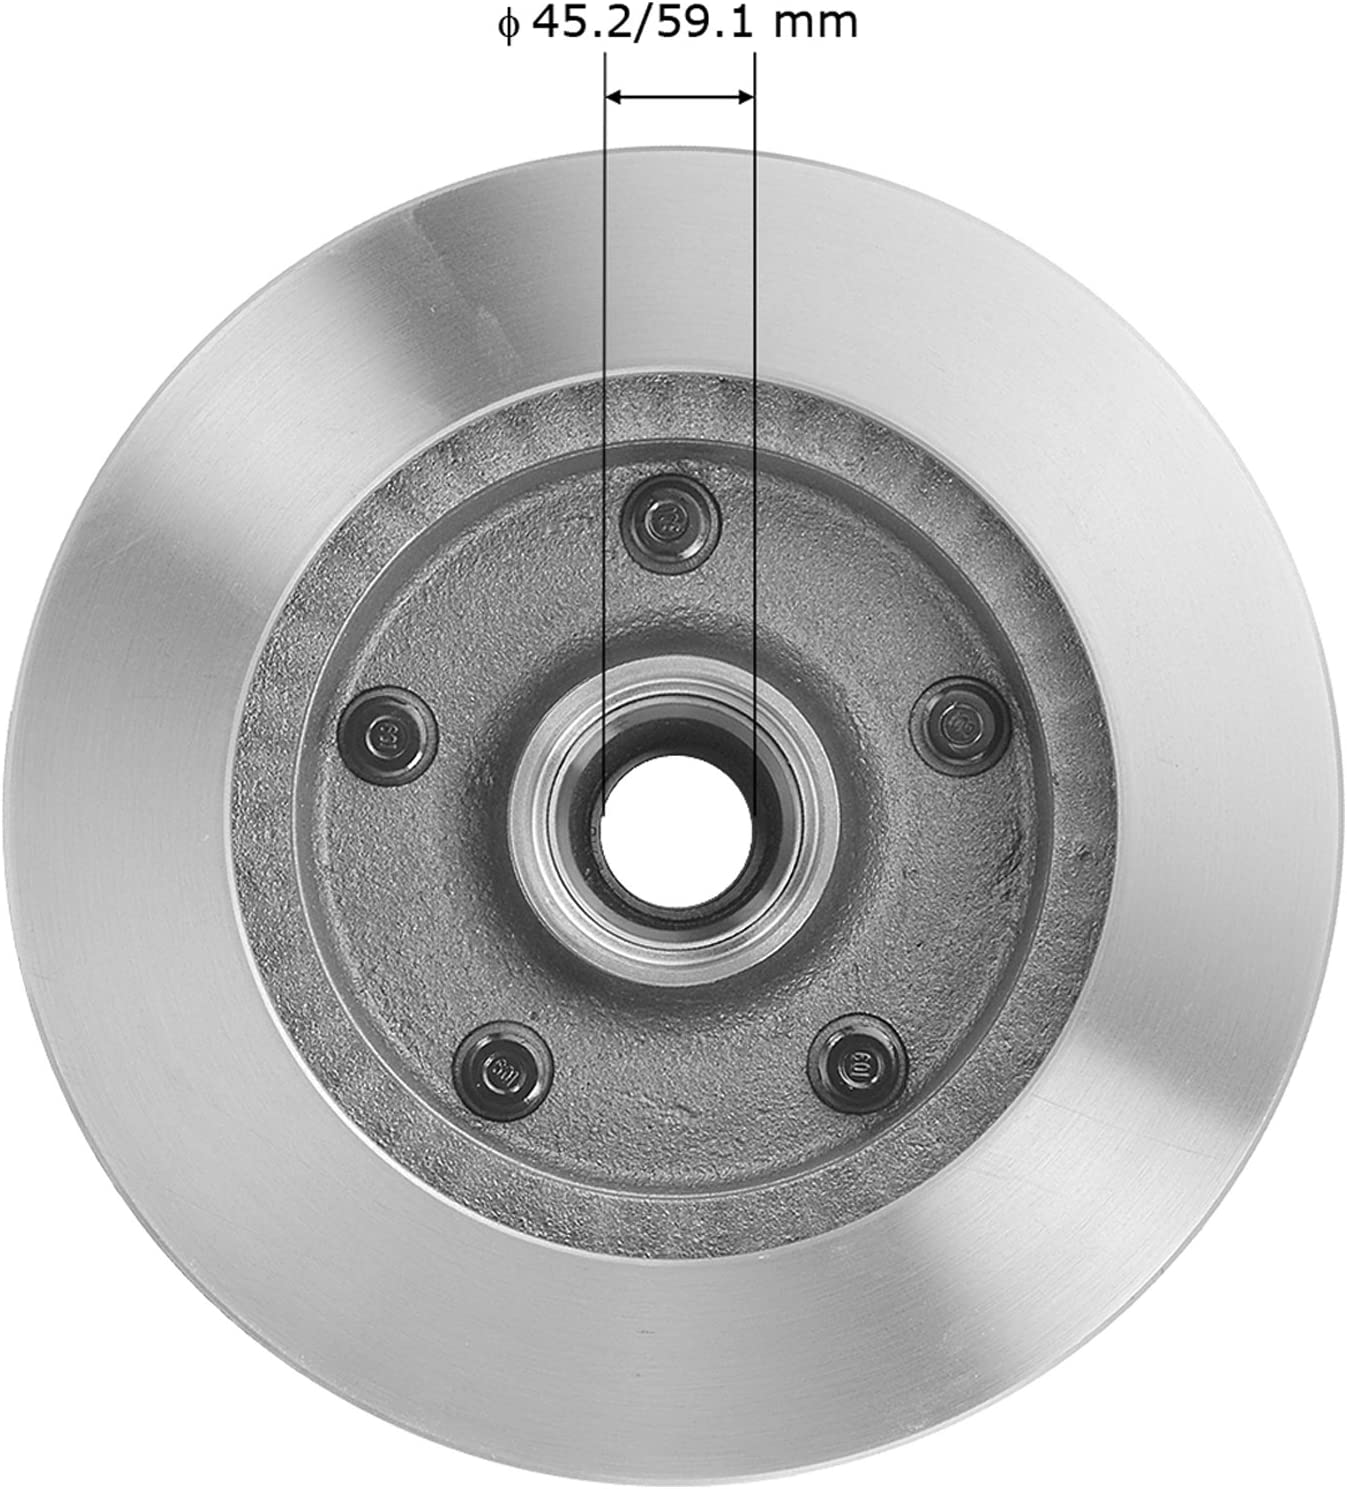 Bendix PRT1067 Brake Rotor